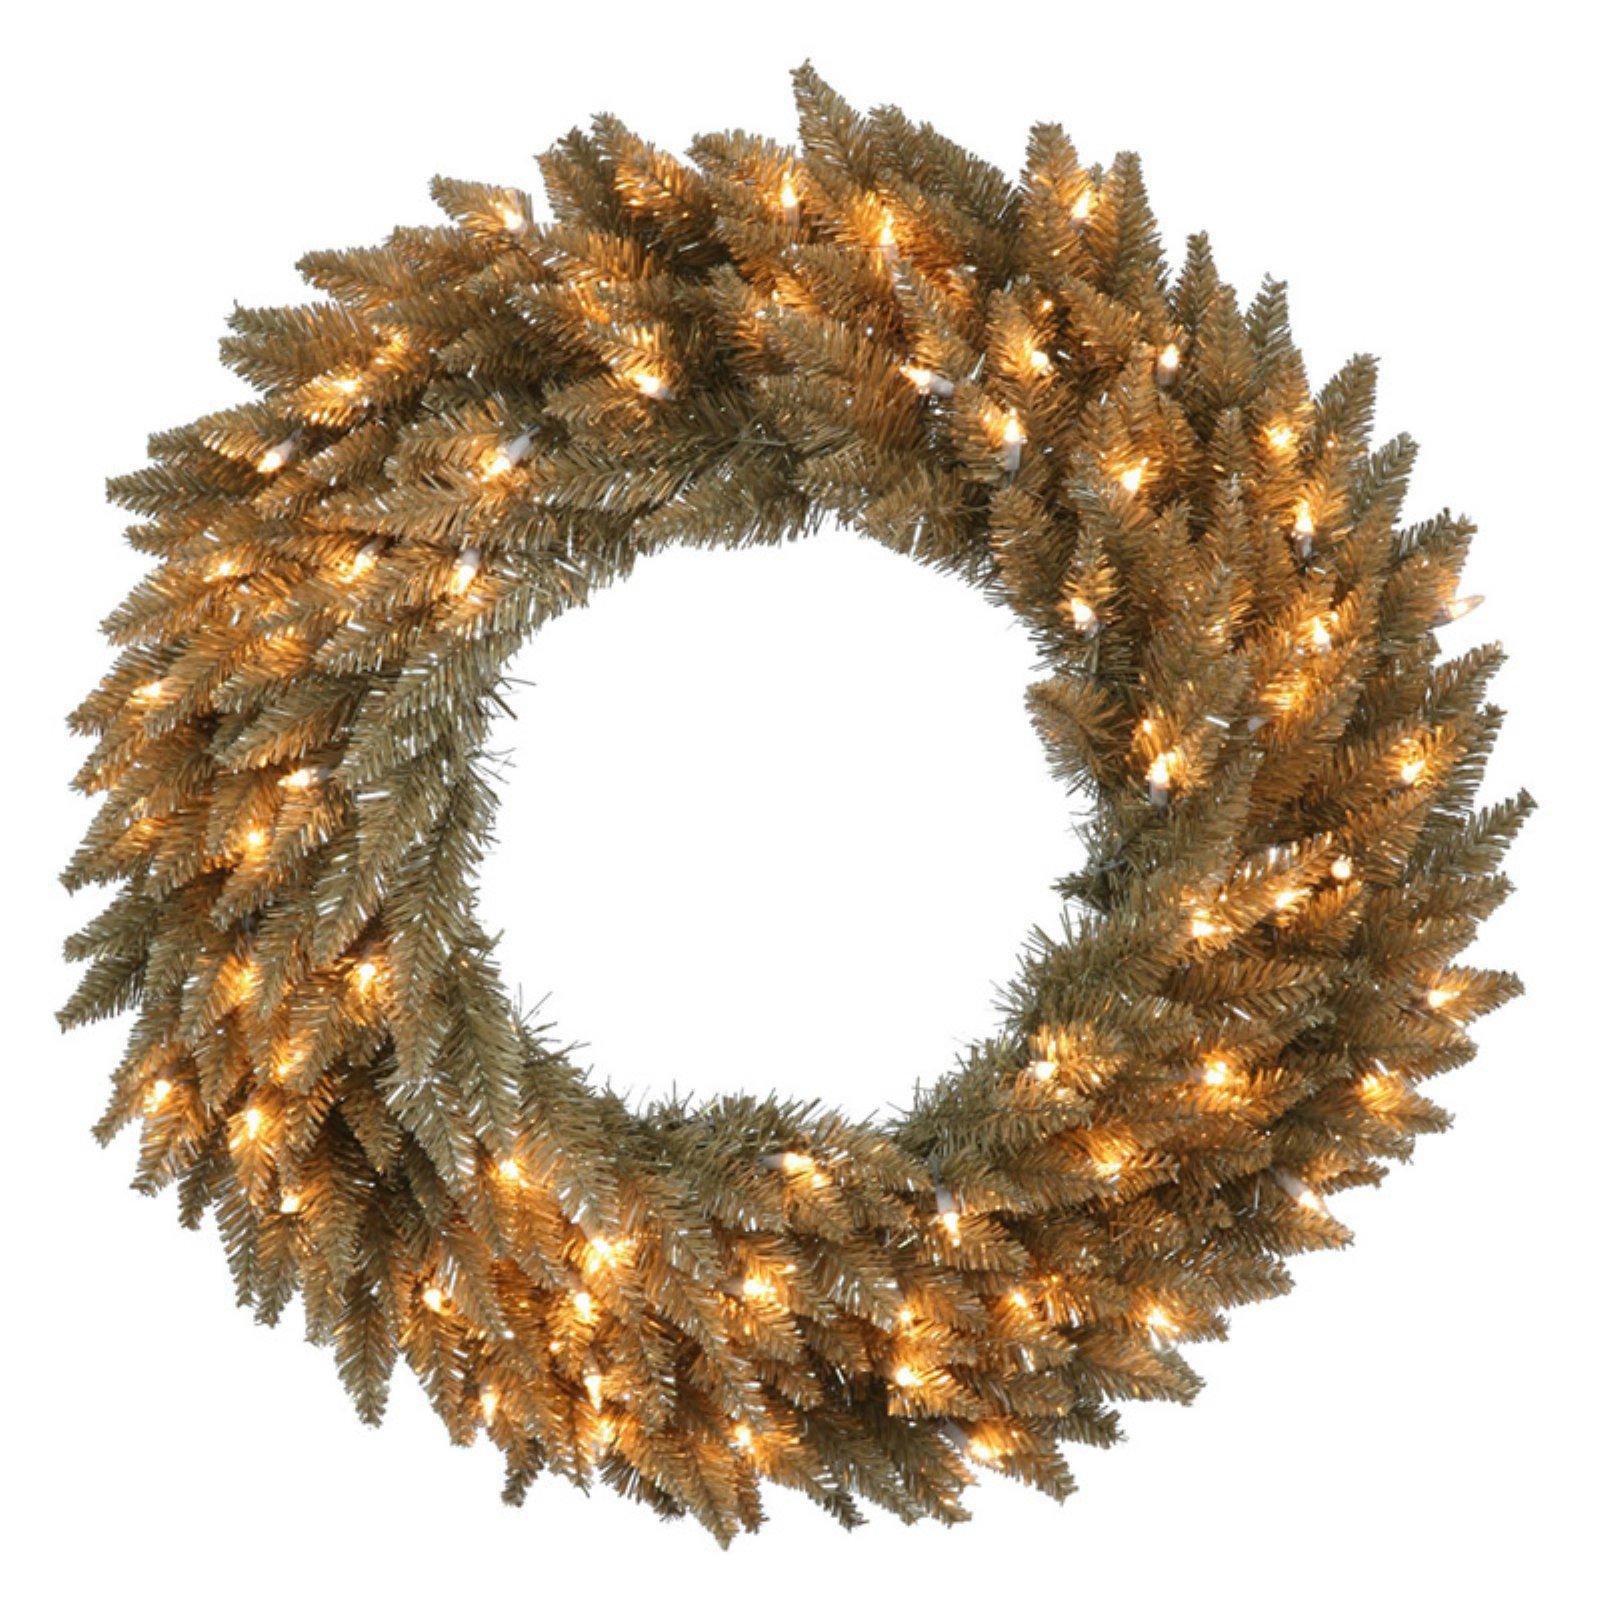 Vickerman Antique Champagne Pre-Lit Wreath - Clear Lights